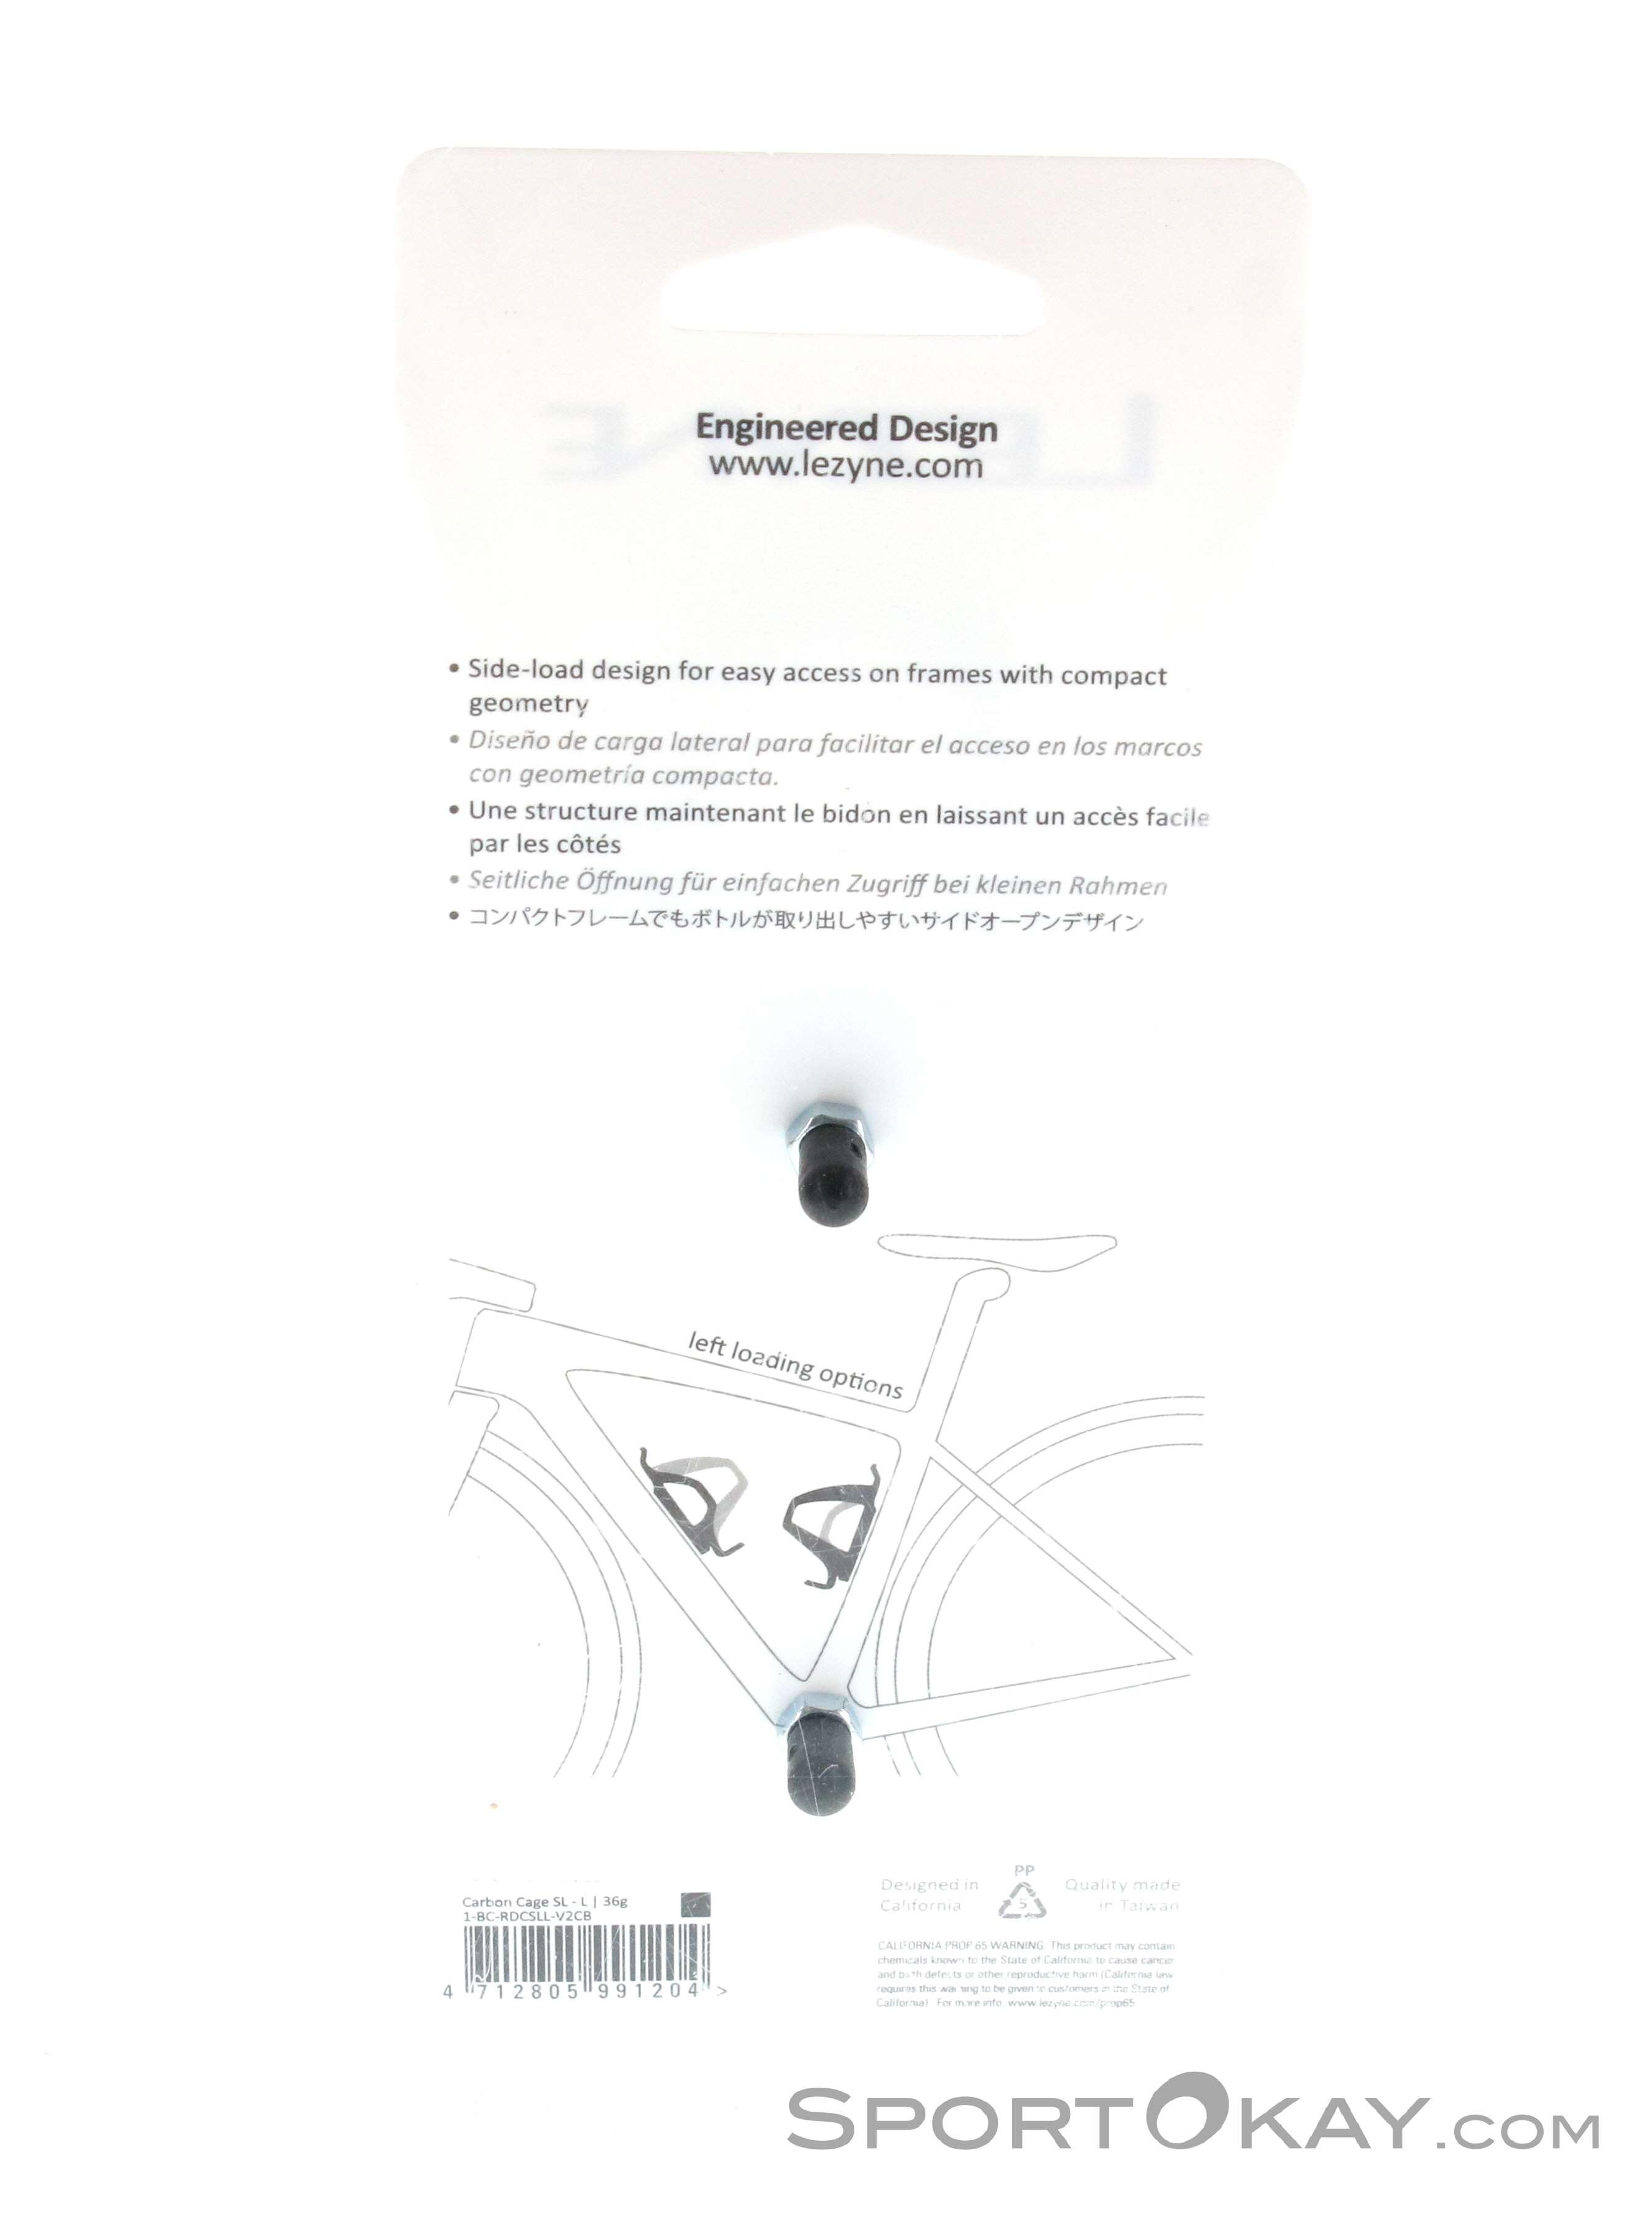 Großzügig Wiederverwendung Glasrahmen Fotos - Rahmen Ideen ...